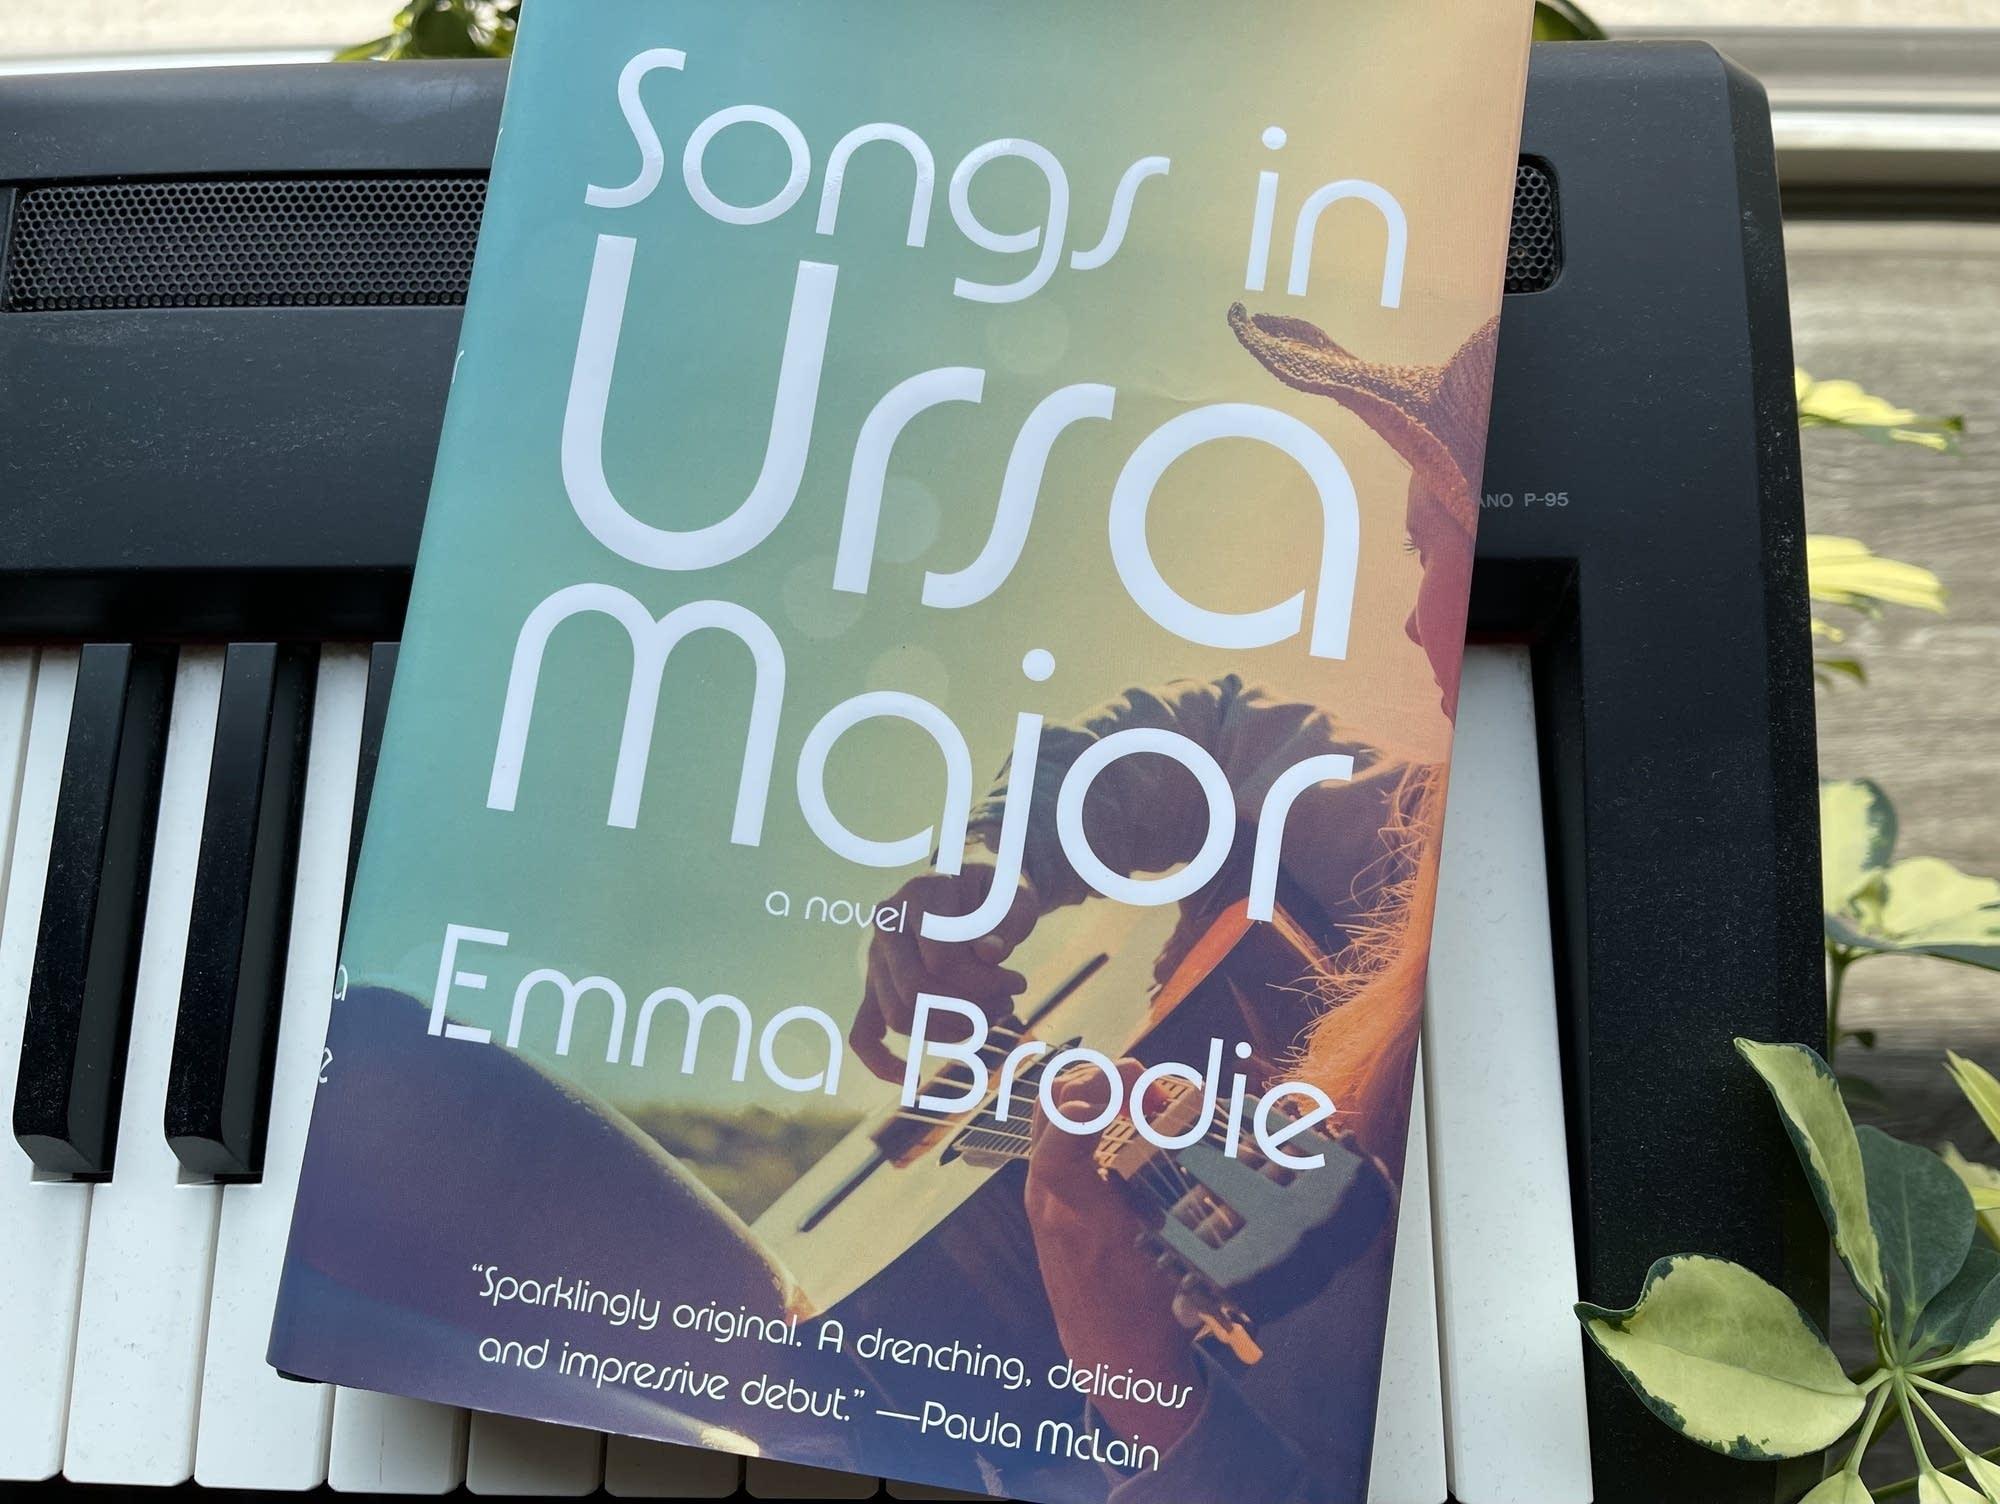 Book on keyboard: 'Songs in Ursa Major.'